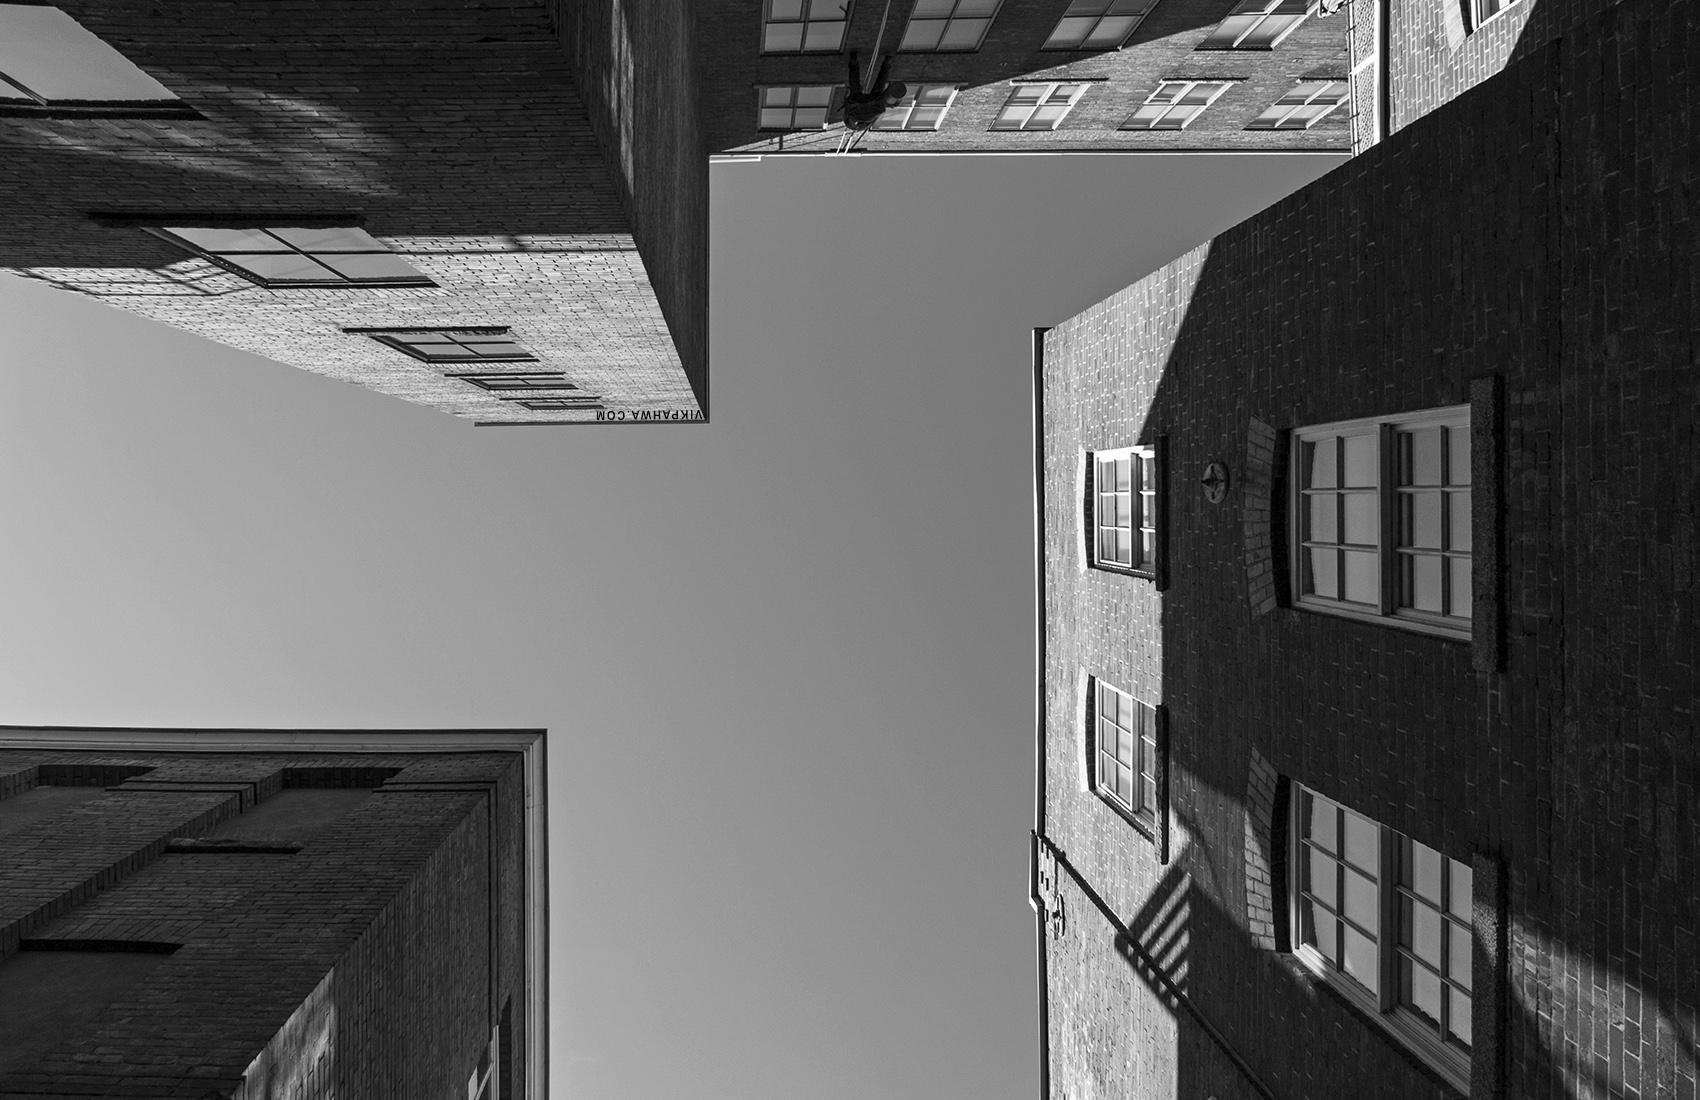 20161019. Looking up at the wonderful massing at Toronto's Berke